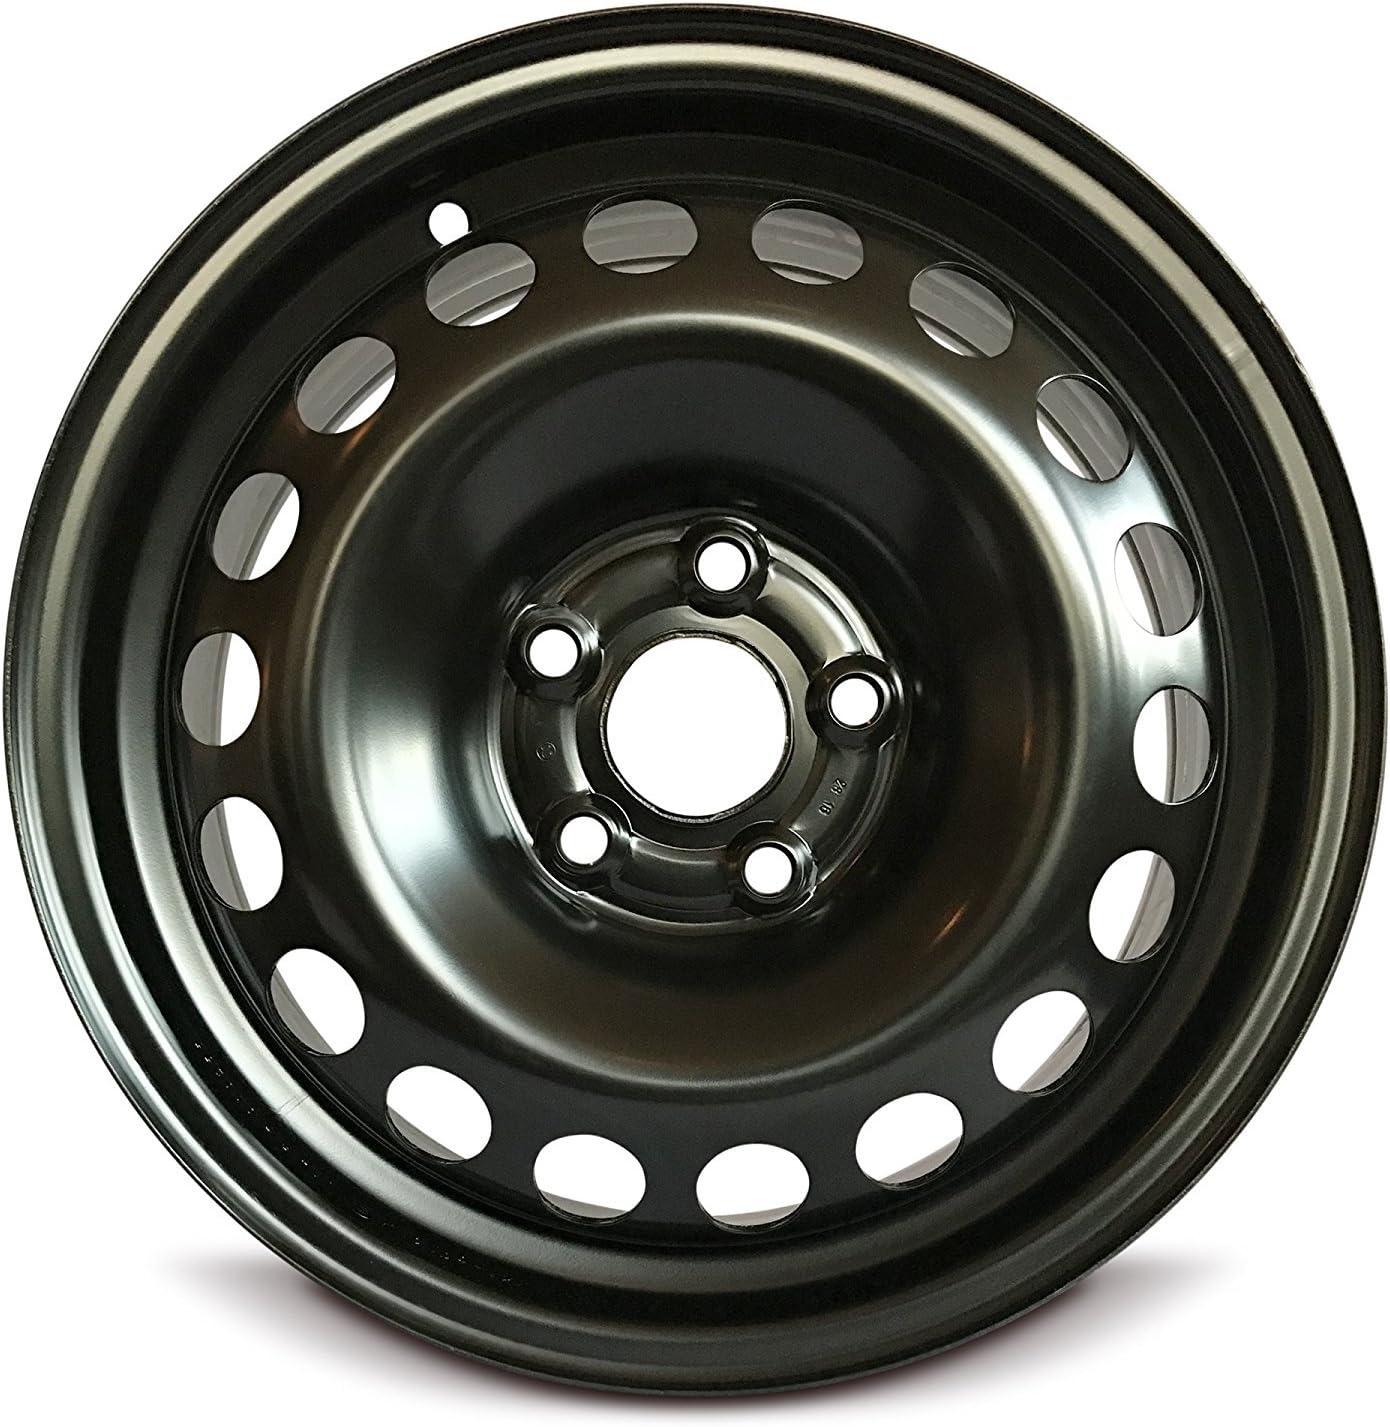 06 07 08 09 10 11 12 13 14 15 16 VOLKSWAGEN JETTA 15 INCH Steel Wheel OEM